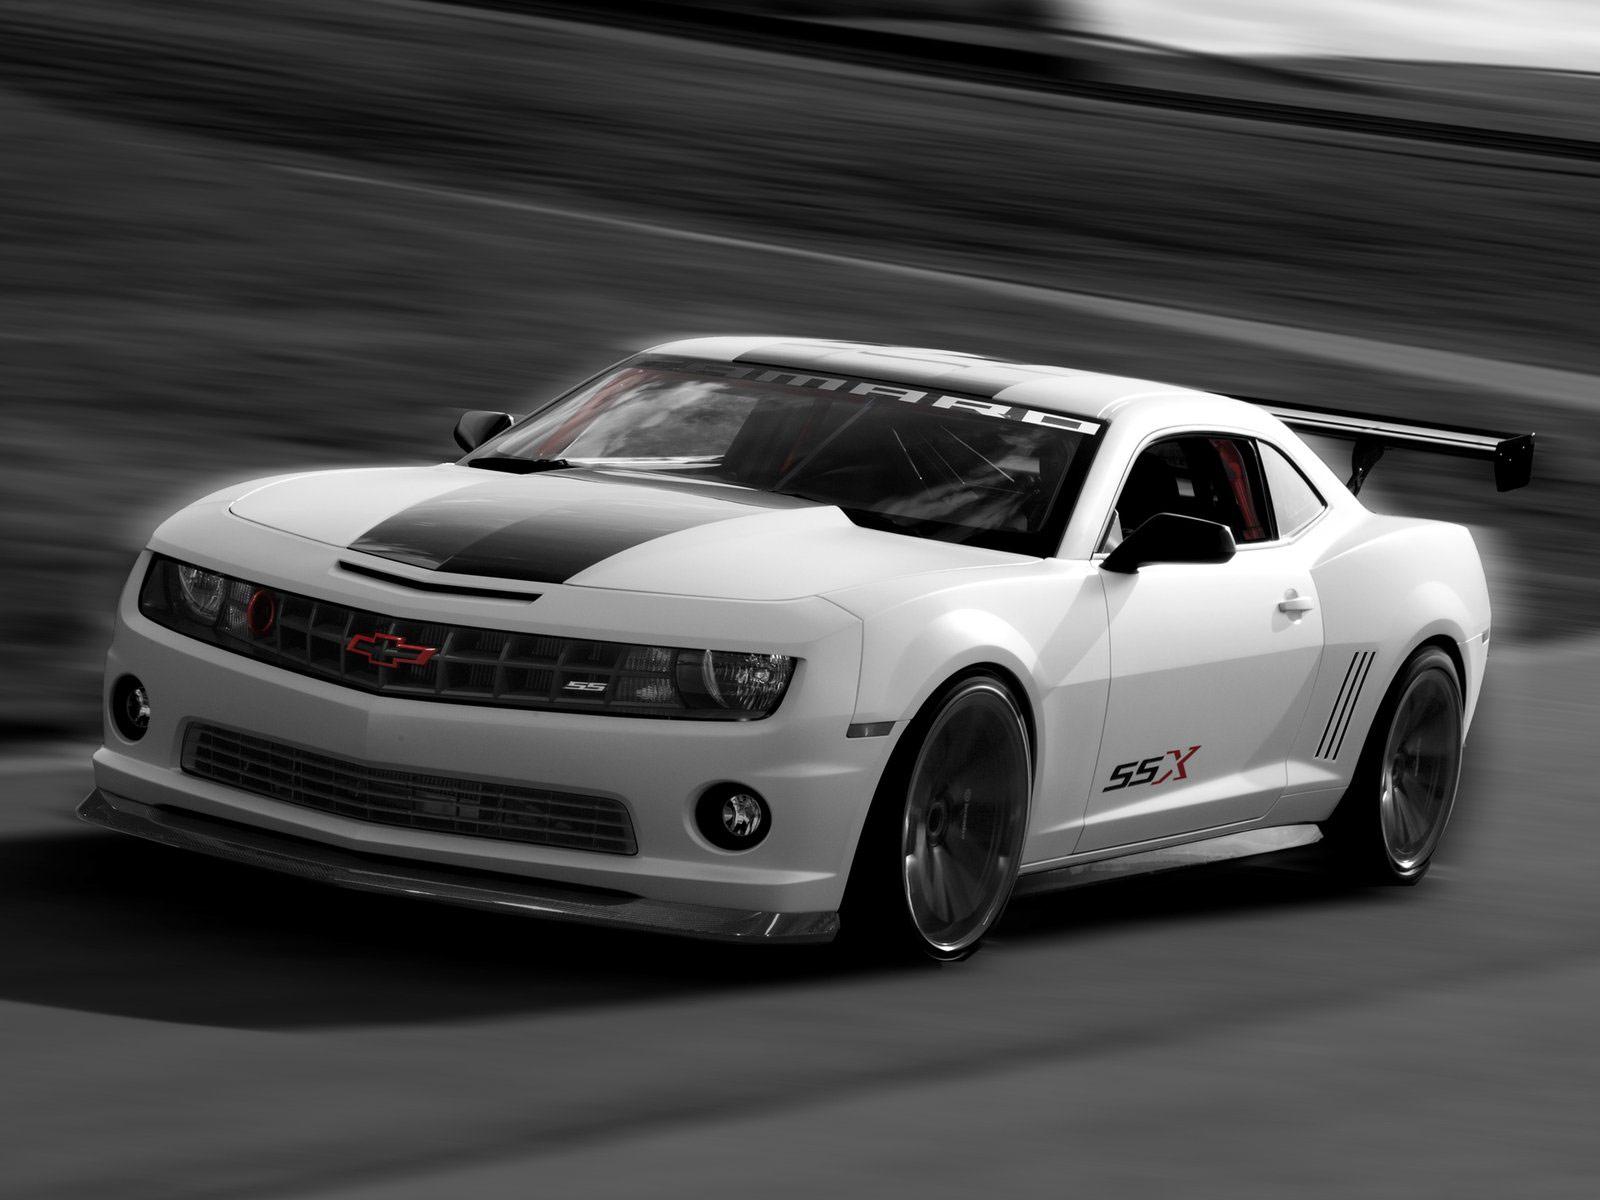 2010 Chevrolet Camaro Ssx Concept